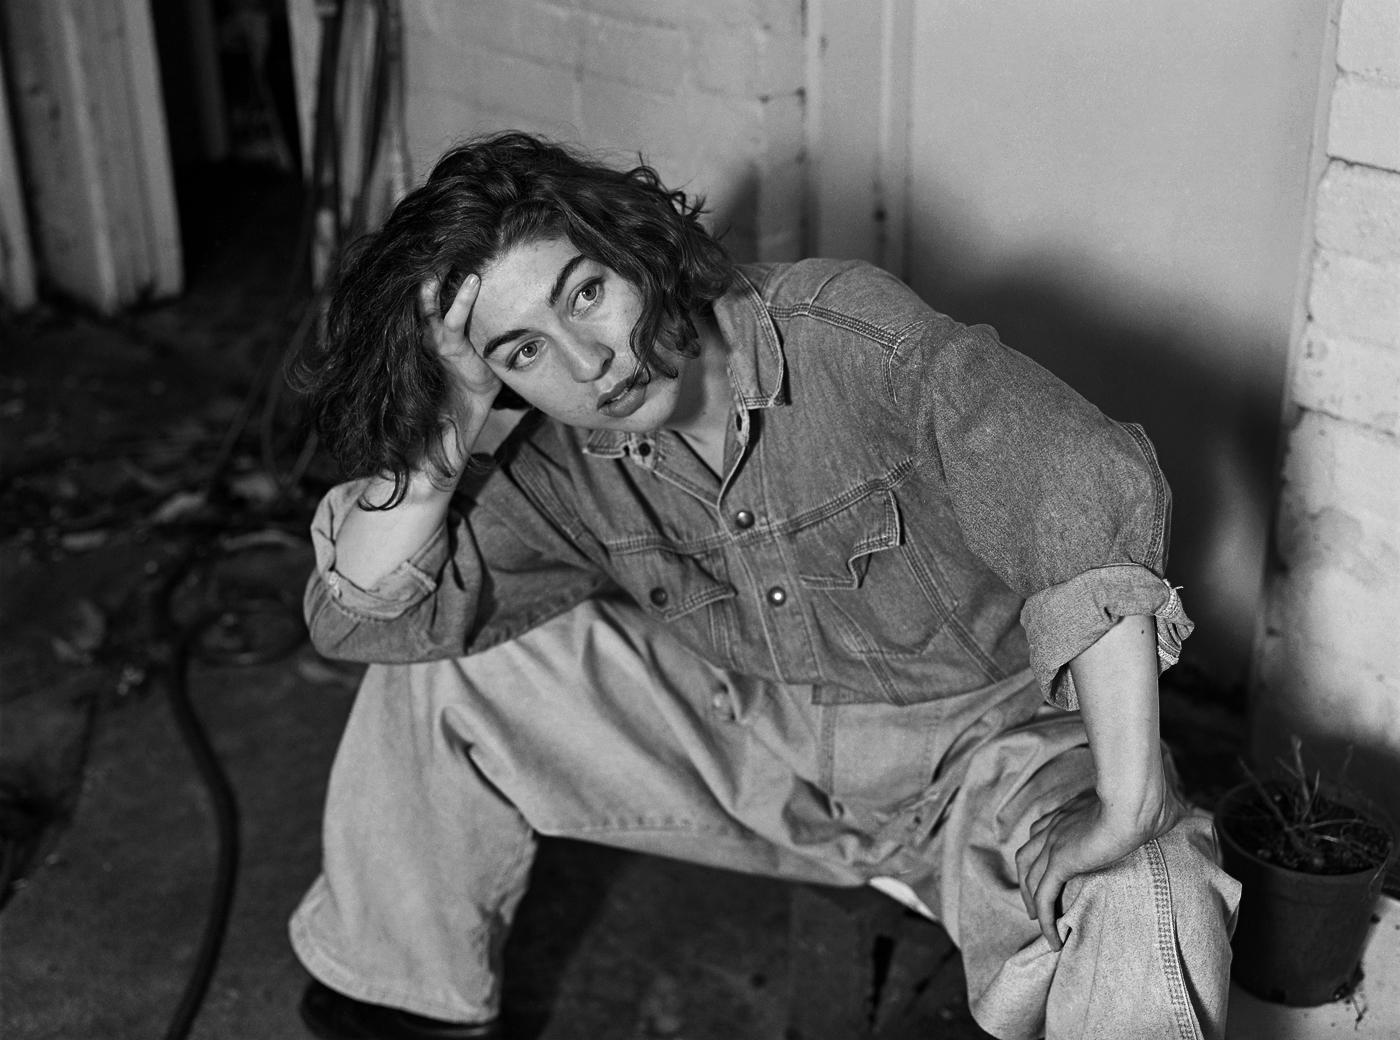 Marcus Bunyan. 'Portraits, South Yarra, Melbourne' 1991-92